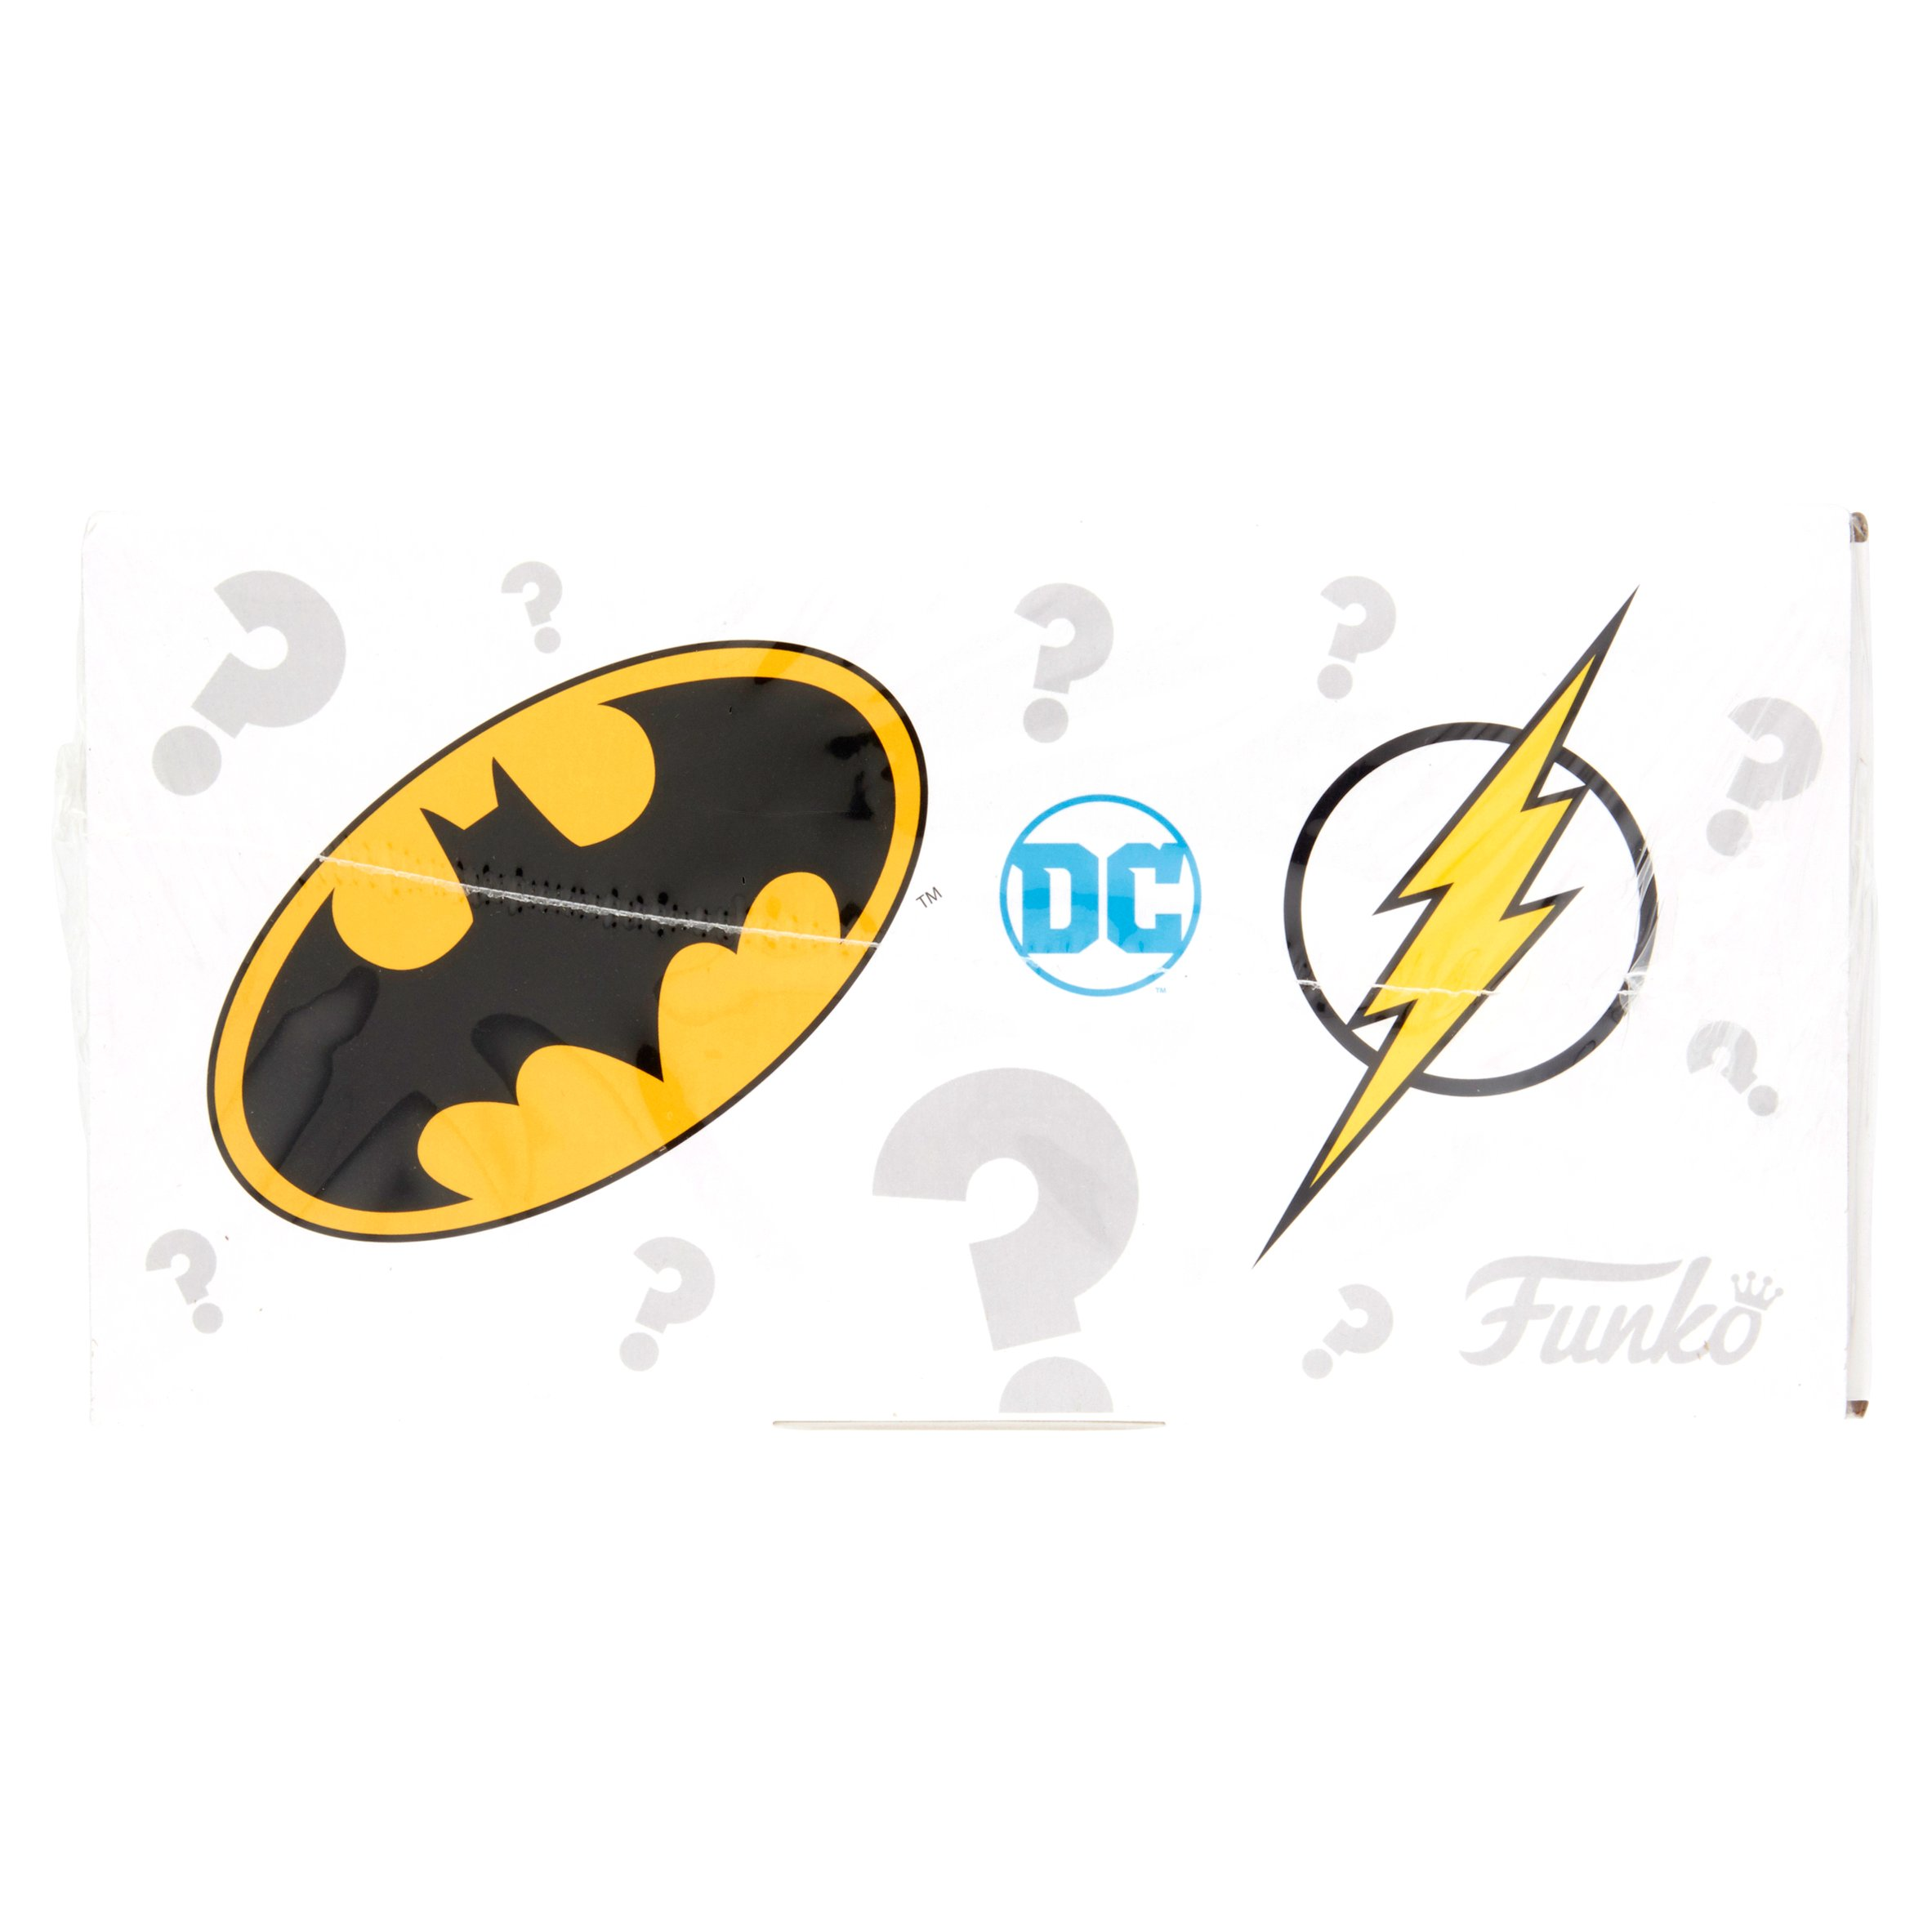 8cbdf70f87c Funko DC Comics Mystery Box Walmart Exclusive - Walmart.com